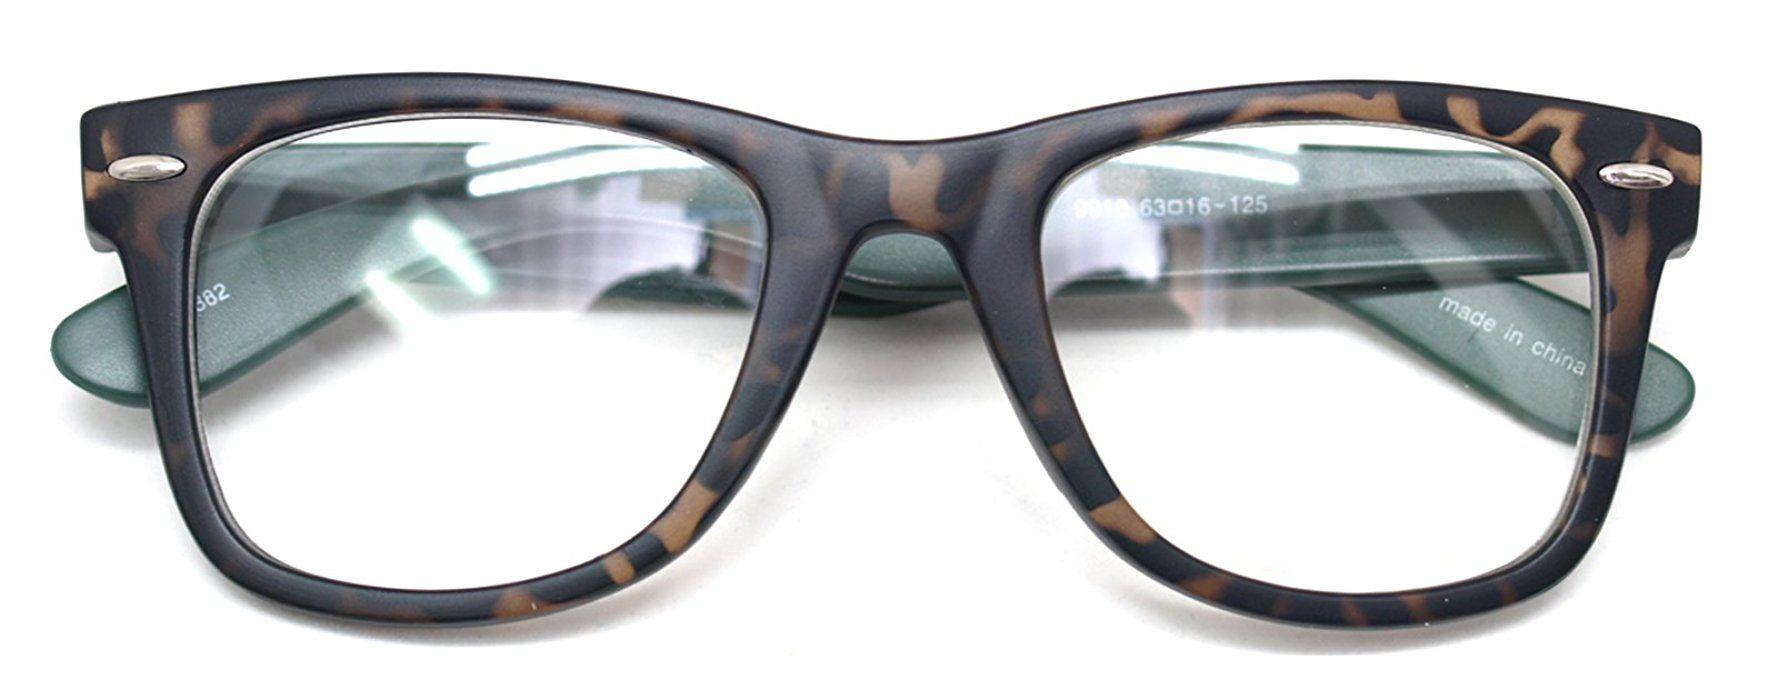 ef72f429d3321 Amazon.com: Classic Horn Rim Nerd Square Eyeglasses Spectacles Geek ...